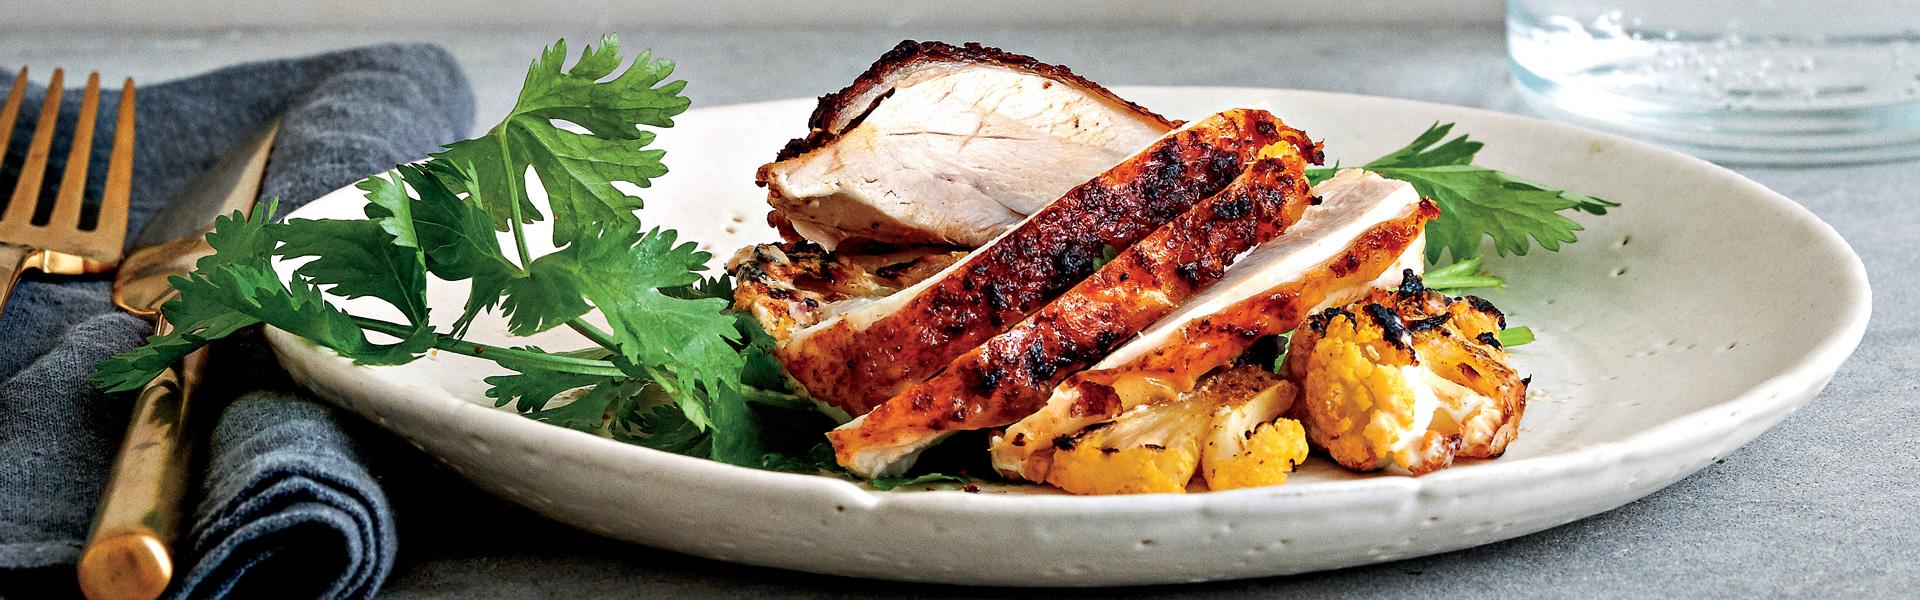 Gwyneth Paltrow: Tikka Masala Roast Chicken Recipe